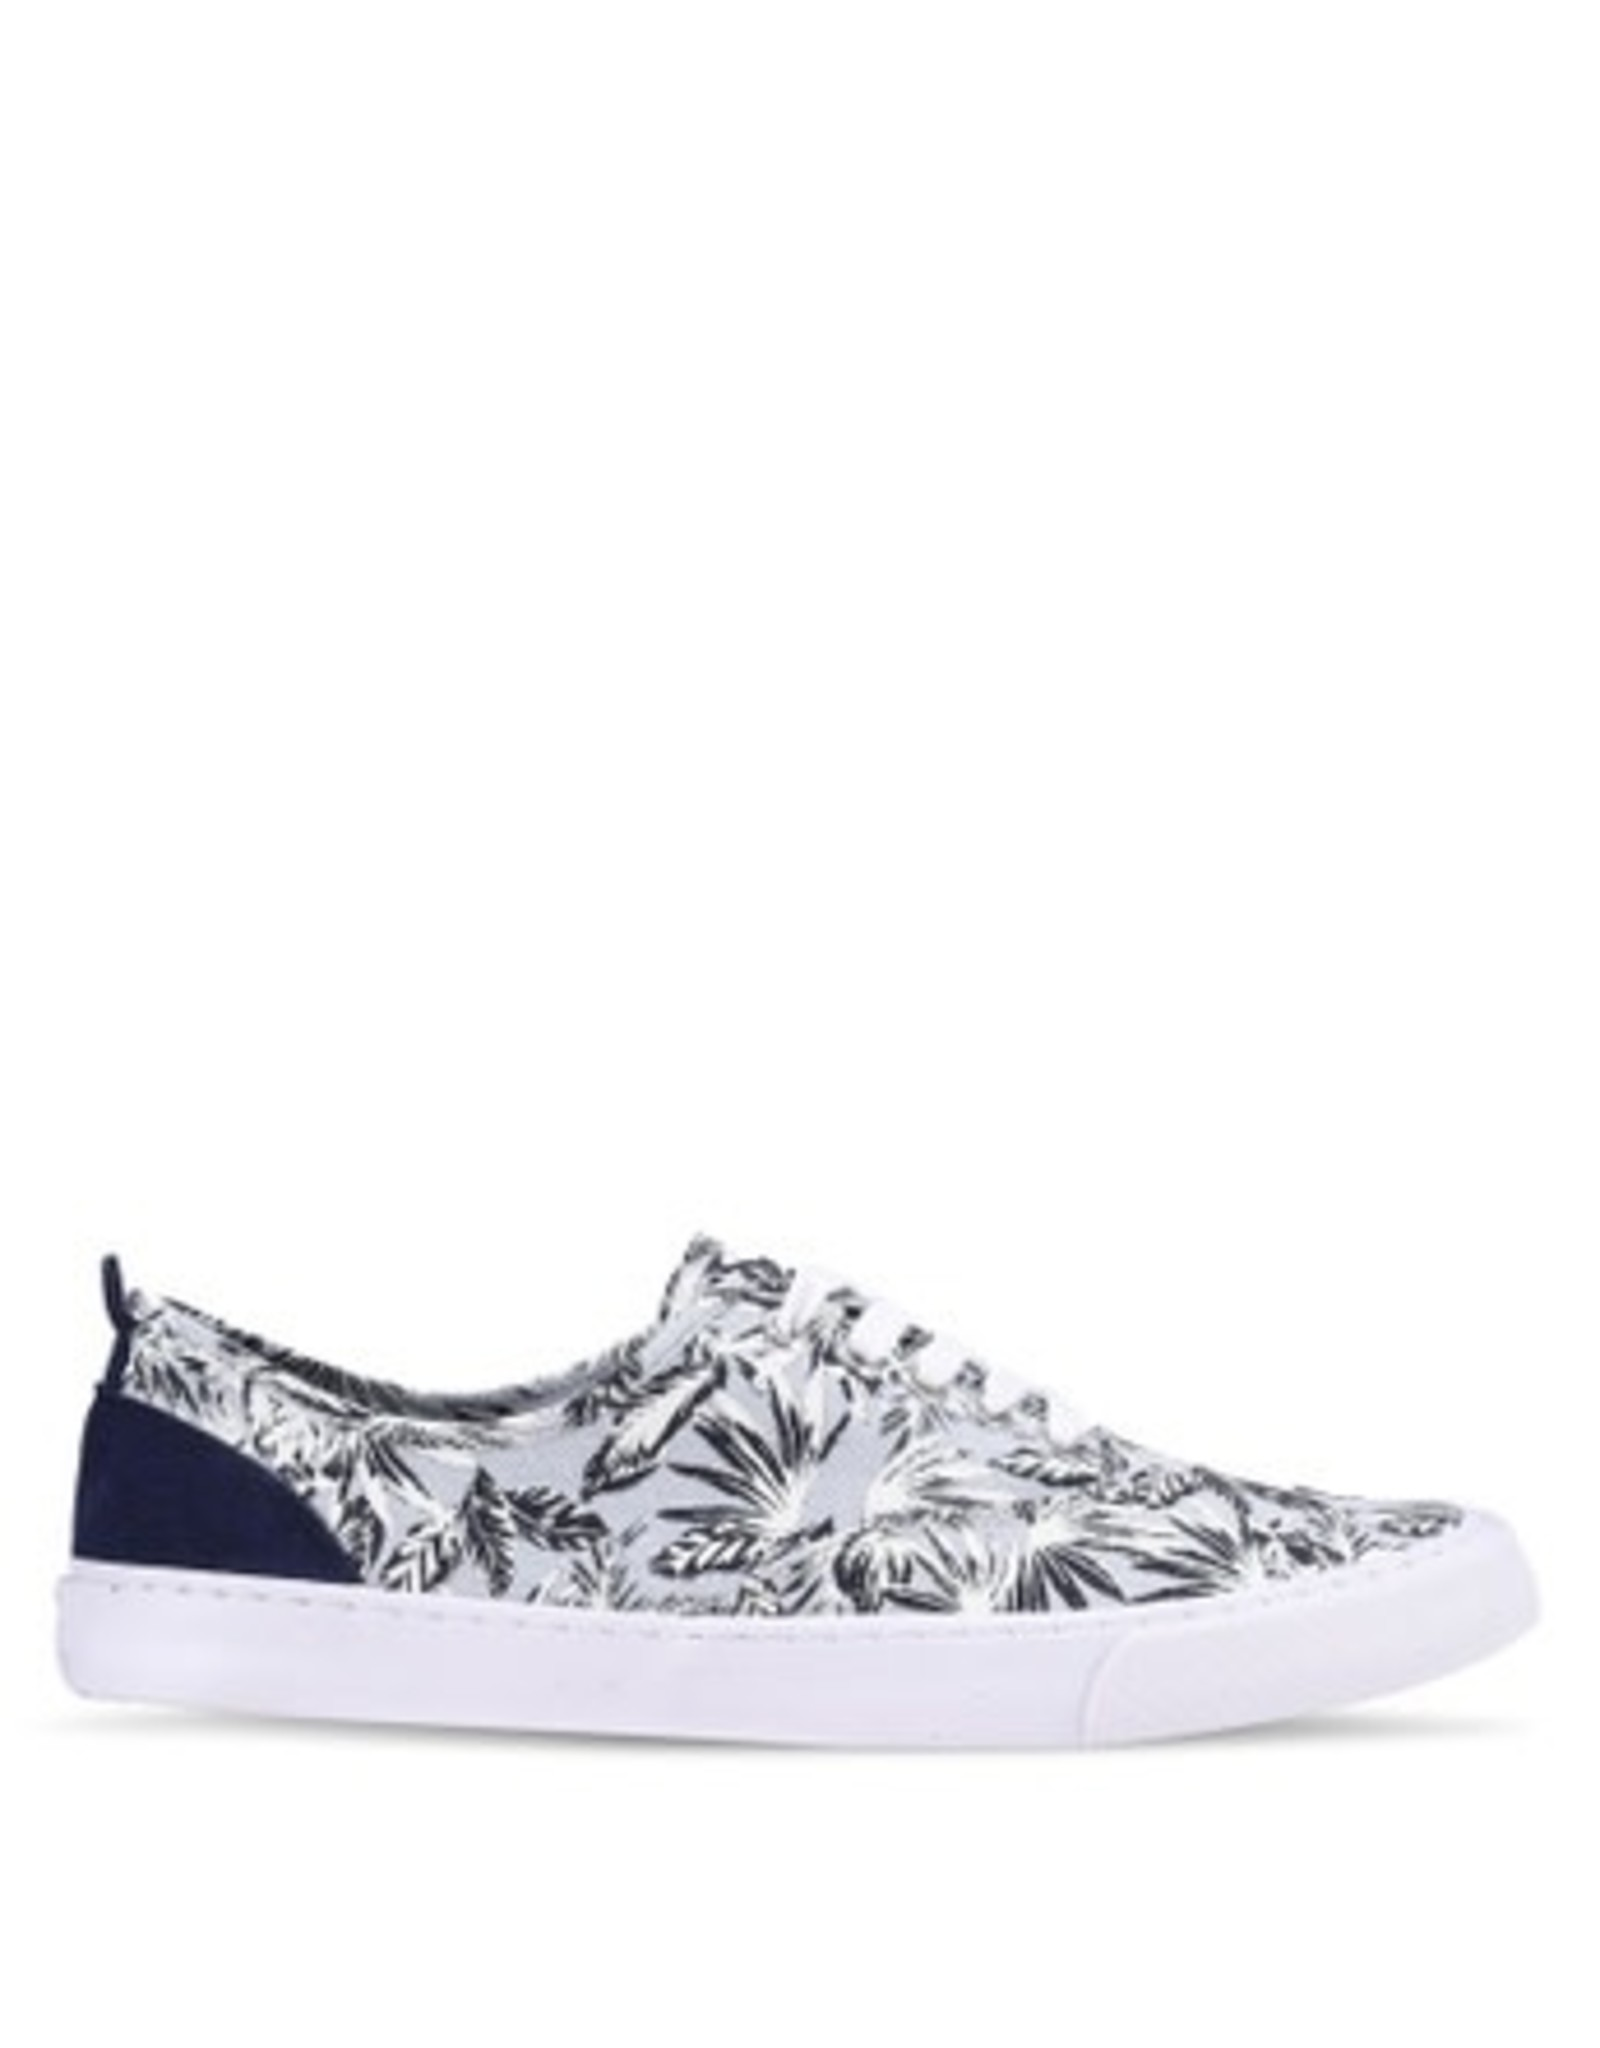 Superdry SD Edit Floral Sneaker